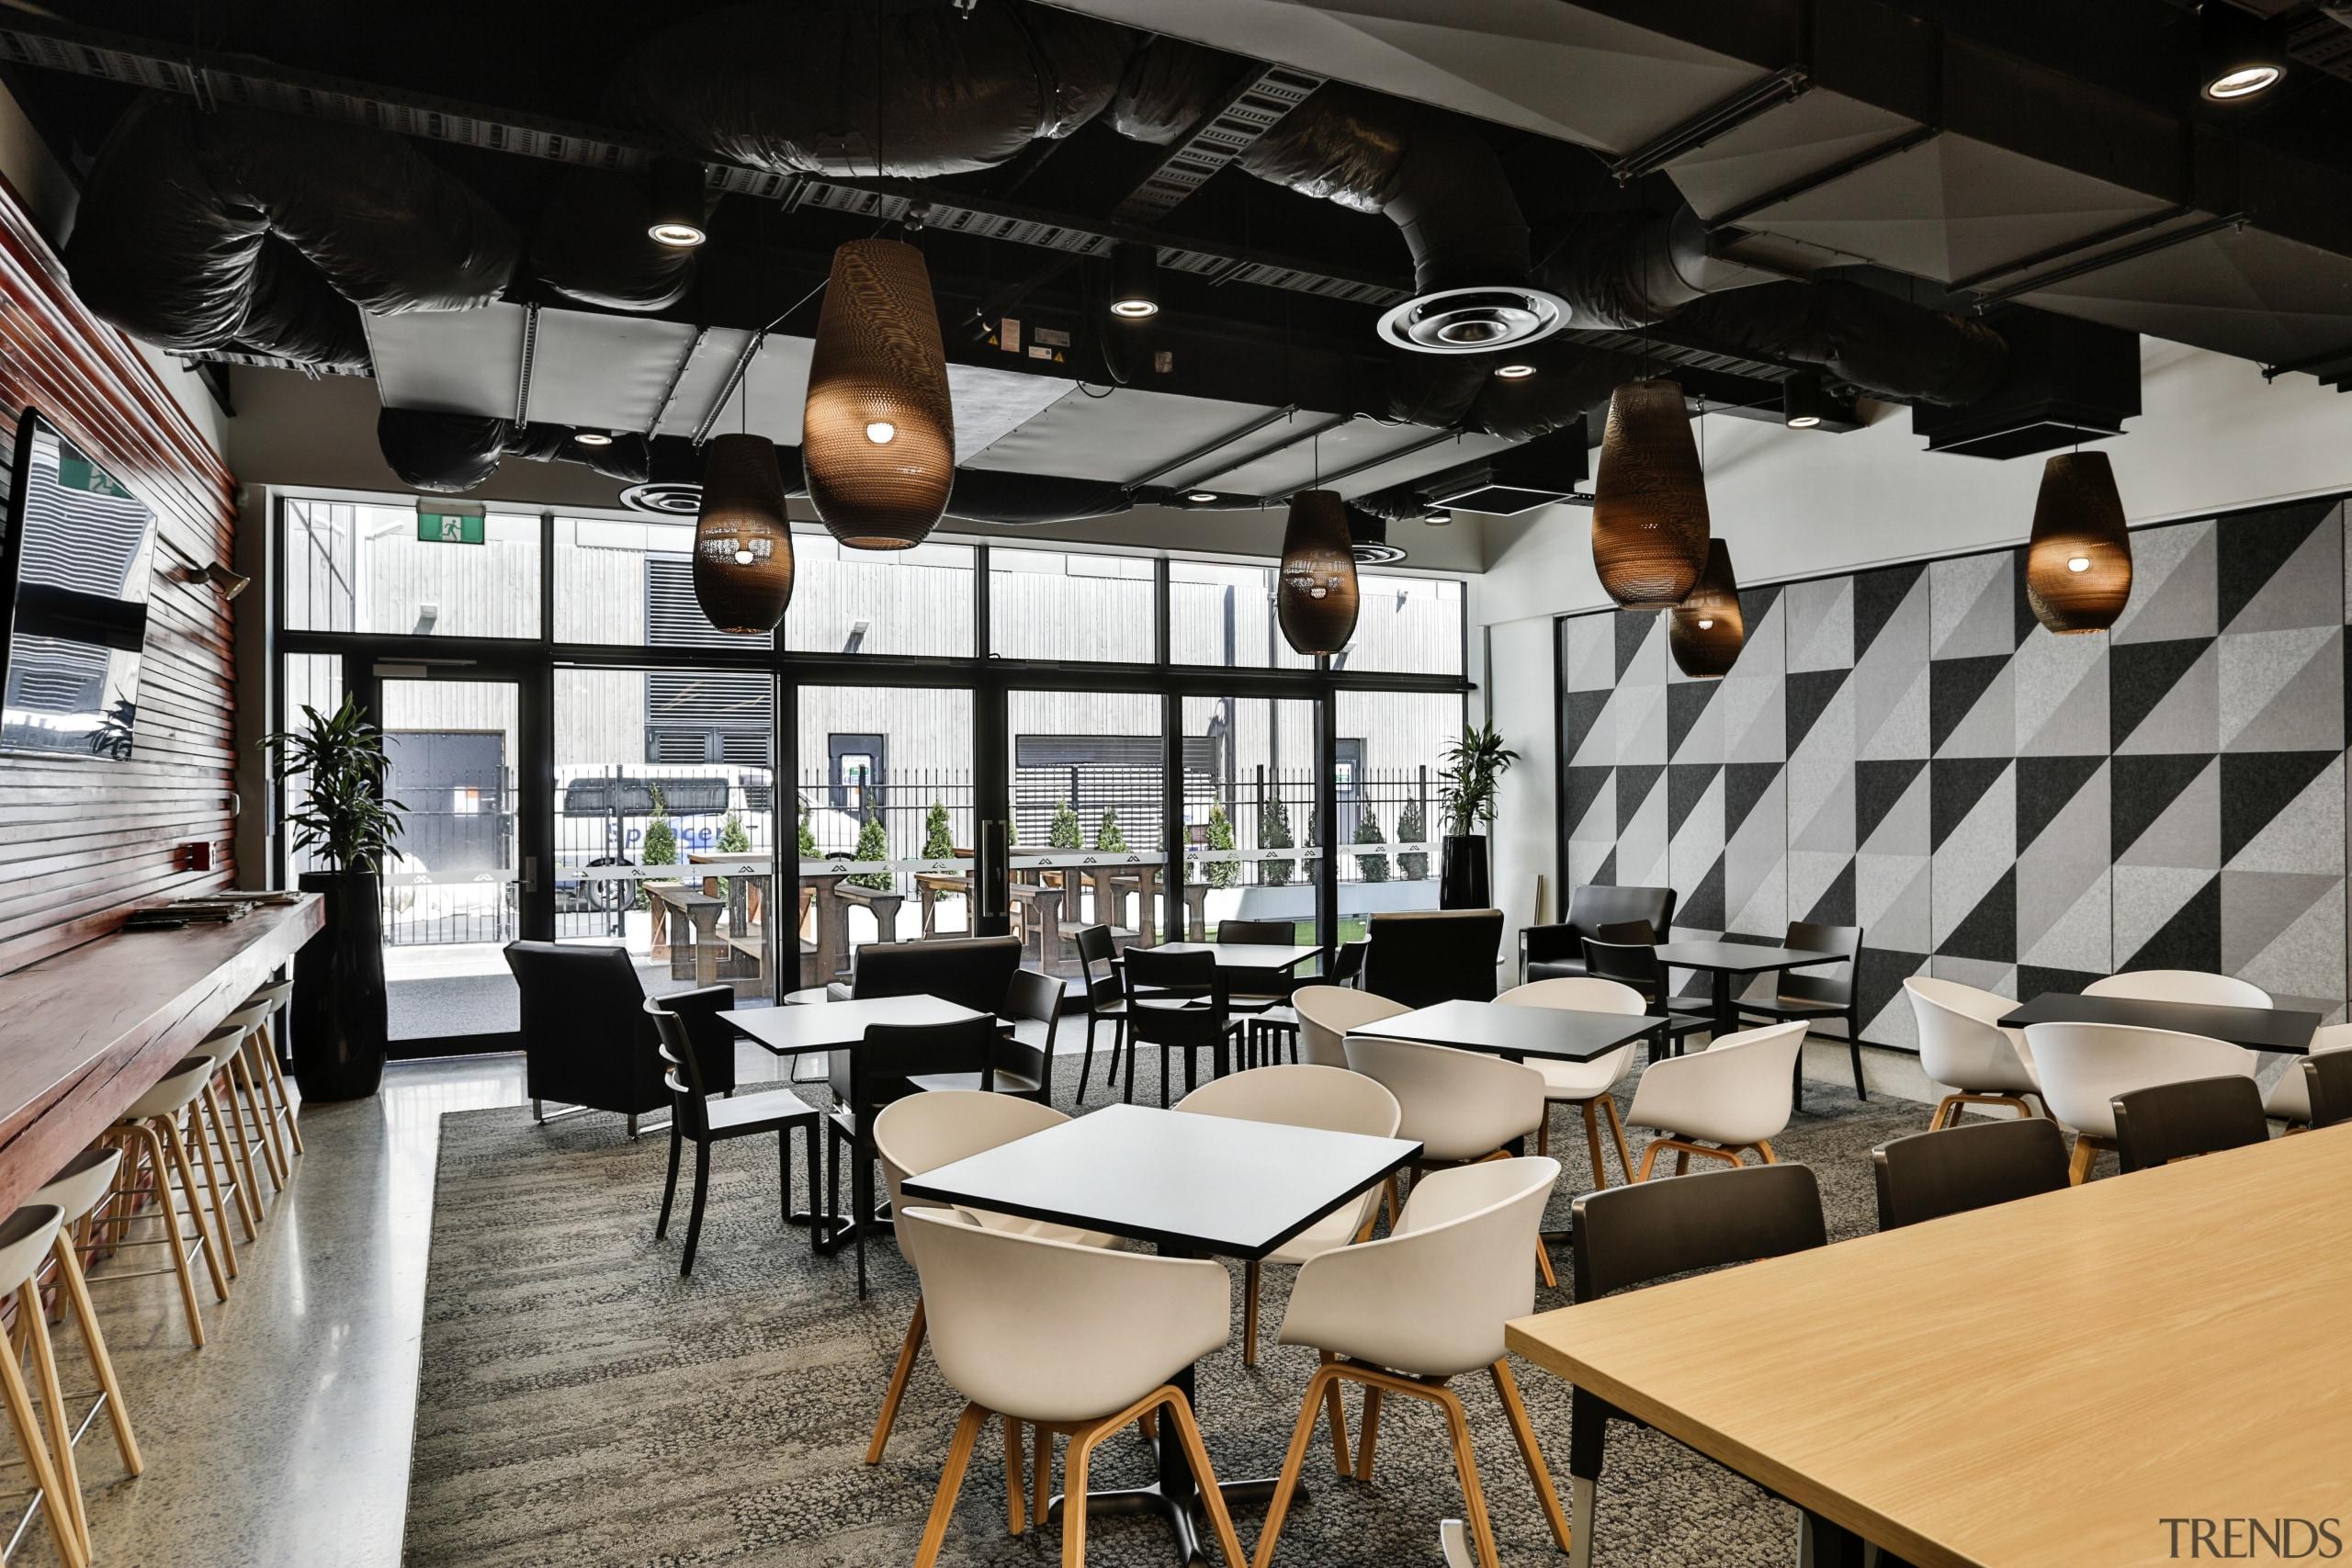 The staff cafe at the new Kathmandu headquarters café, interior design, restaurant, table, black, gray